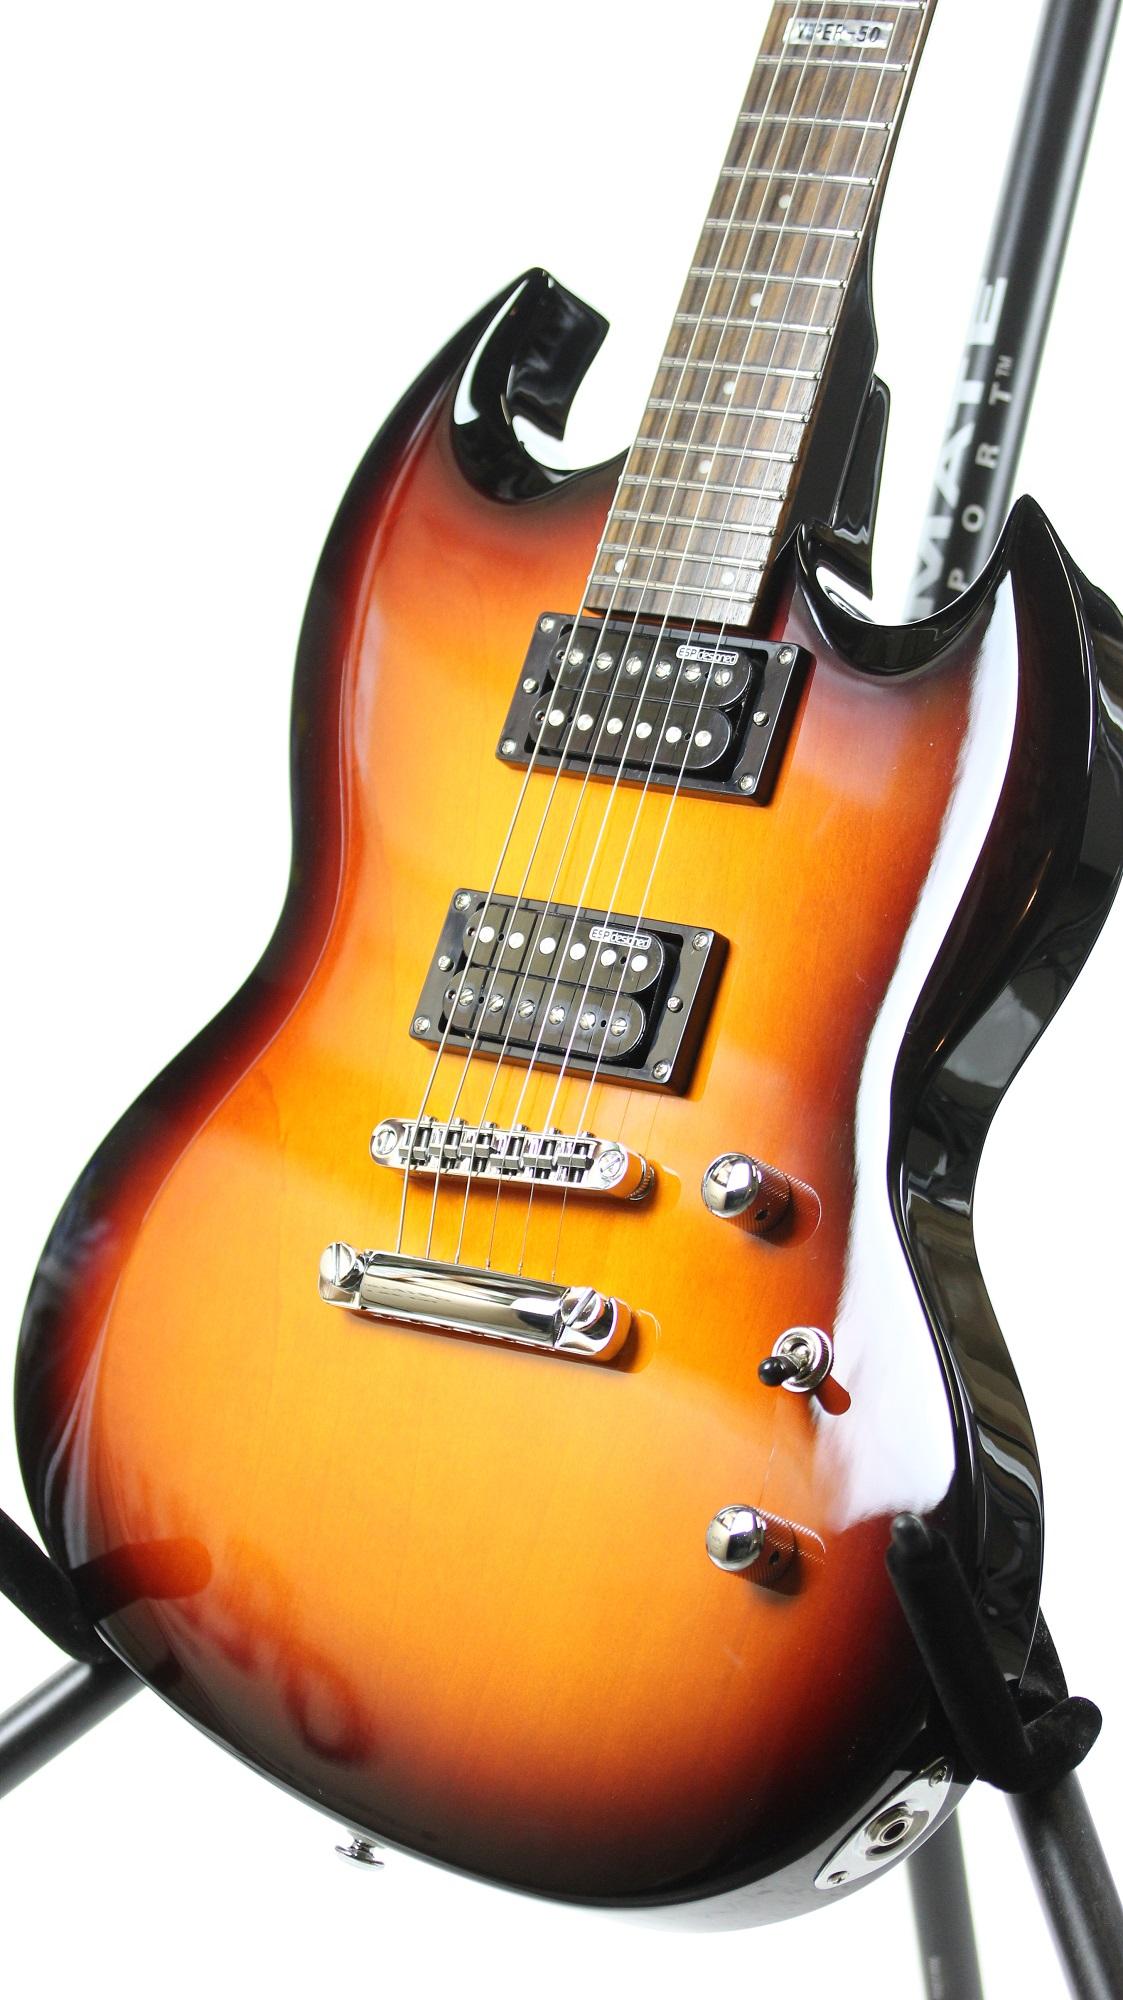 esp ltd viper 50 2 tone burst sample prototype electric guitar 6. Black Bedroom Furniture Sets. Home Design Ideas